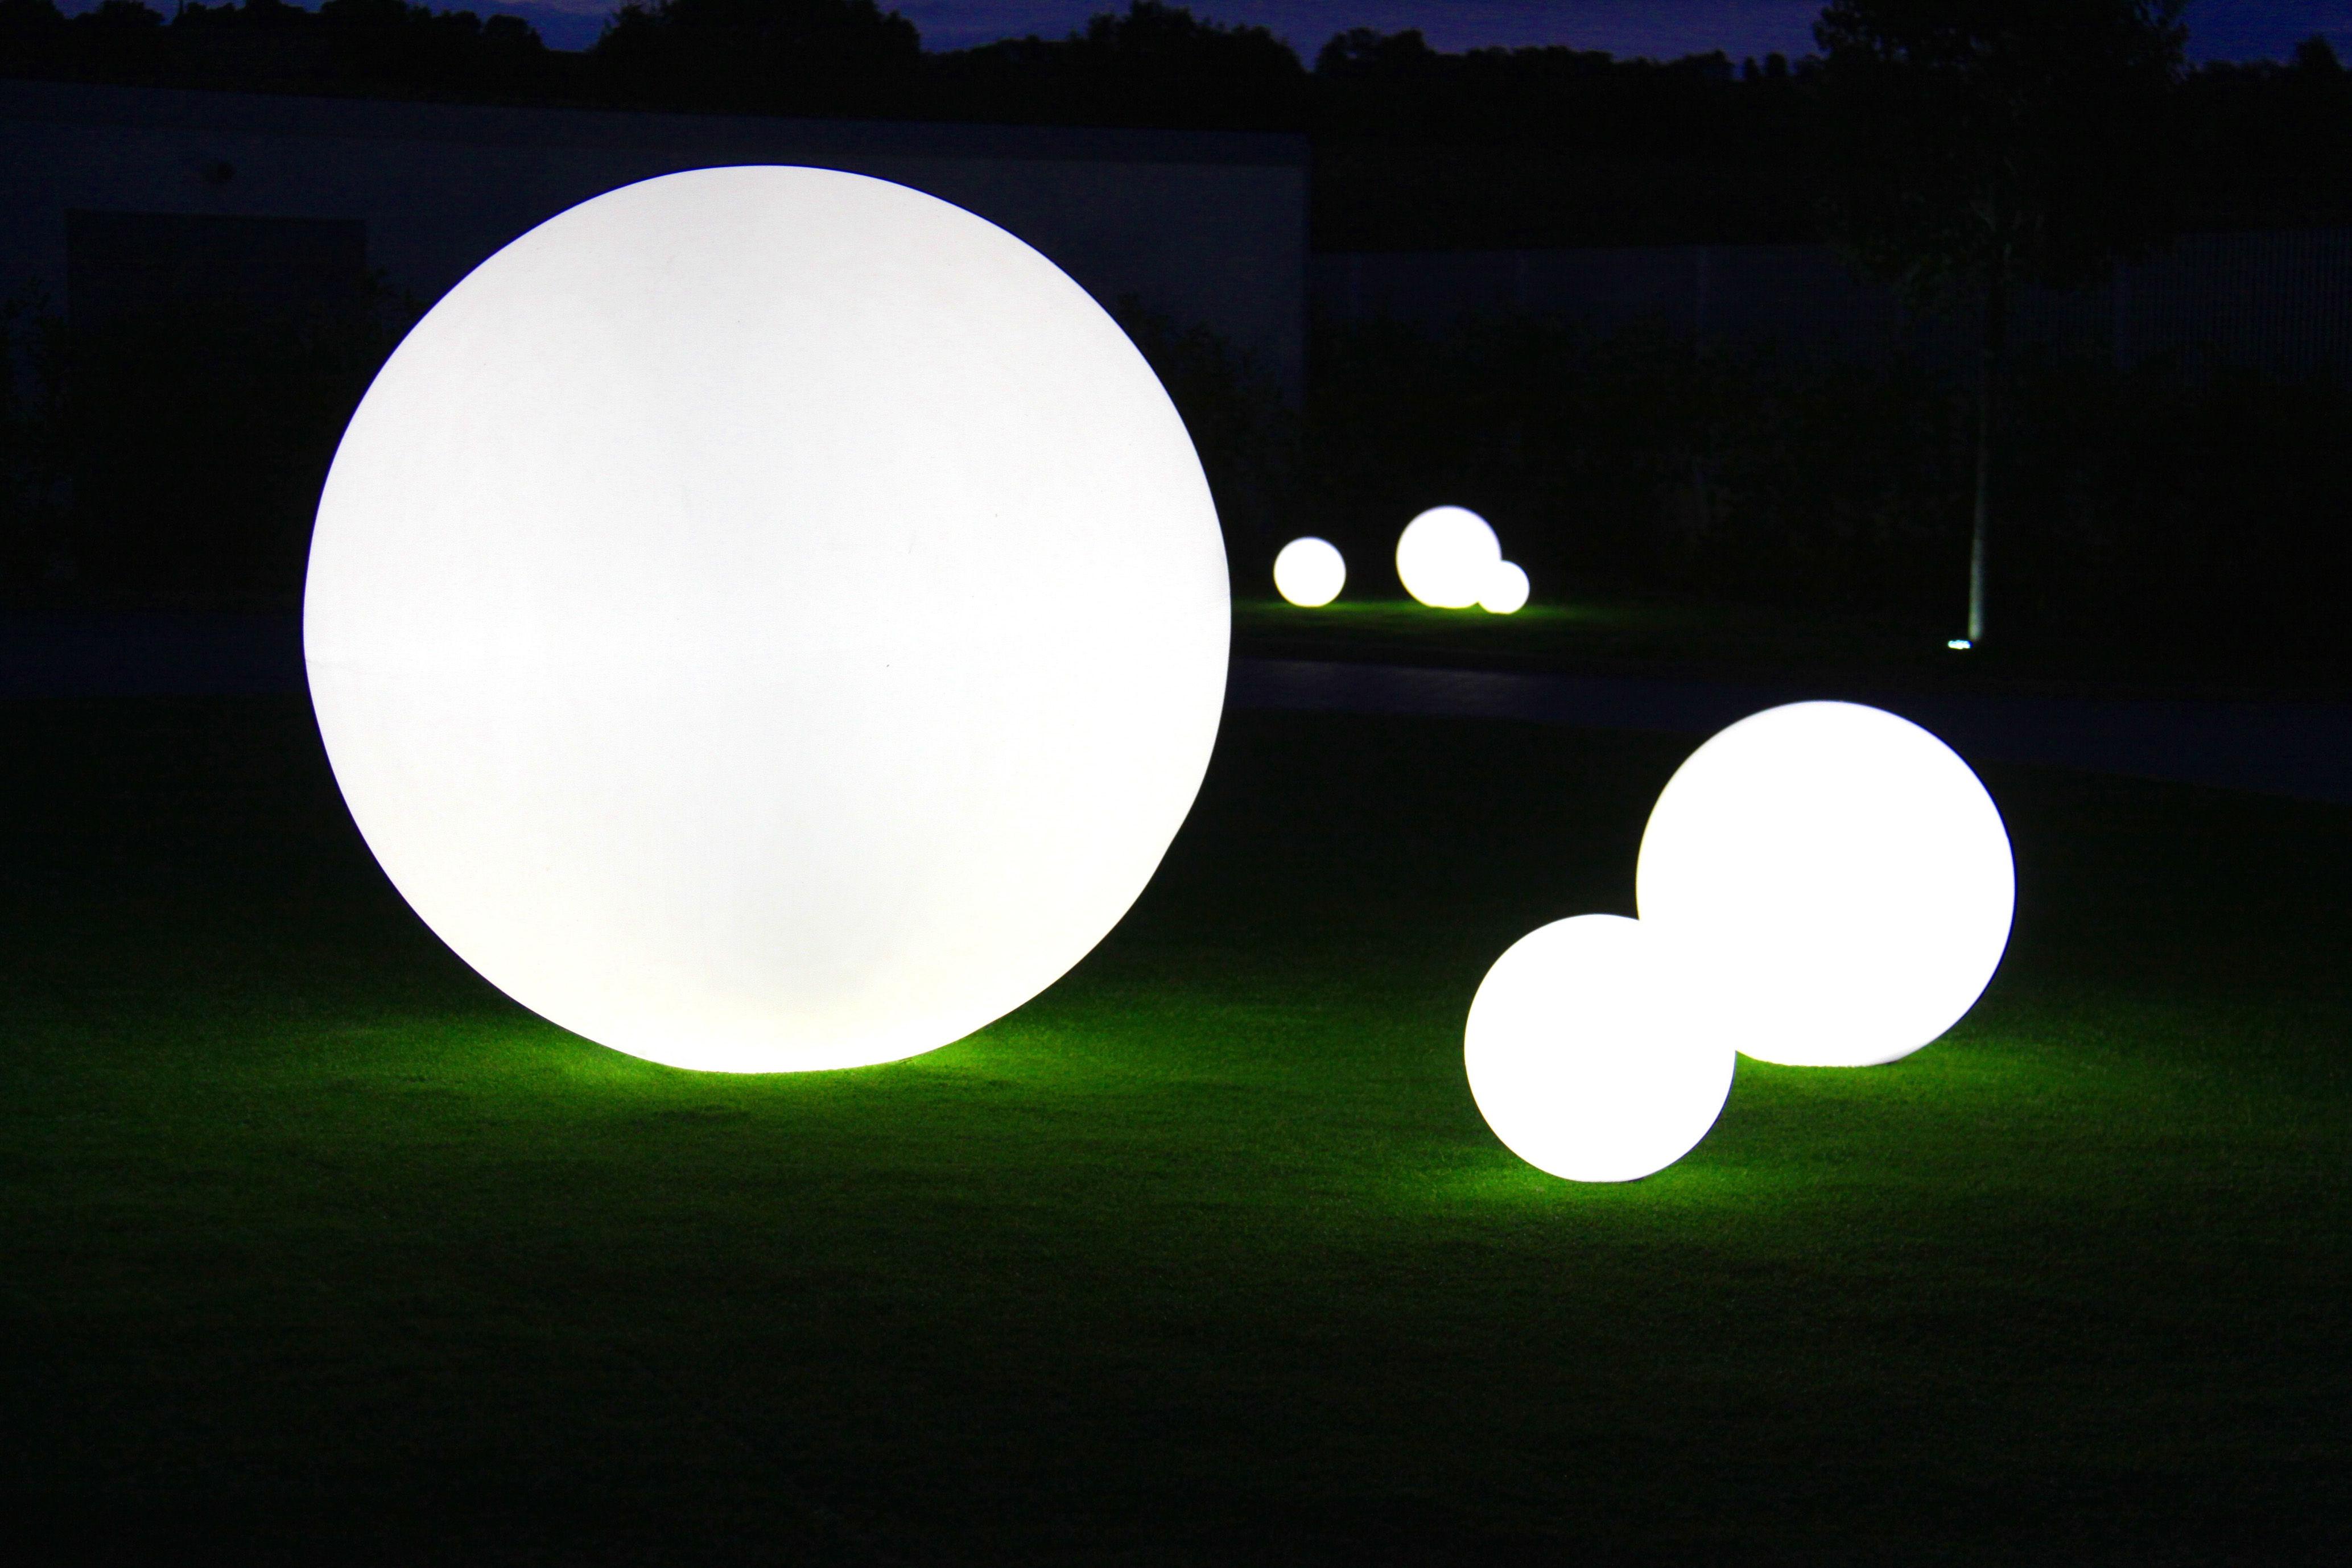 Scopri lampada senza fili globo outdoor led Ø cm per l